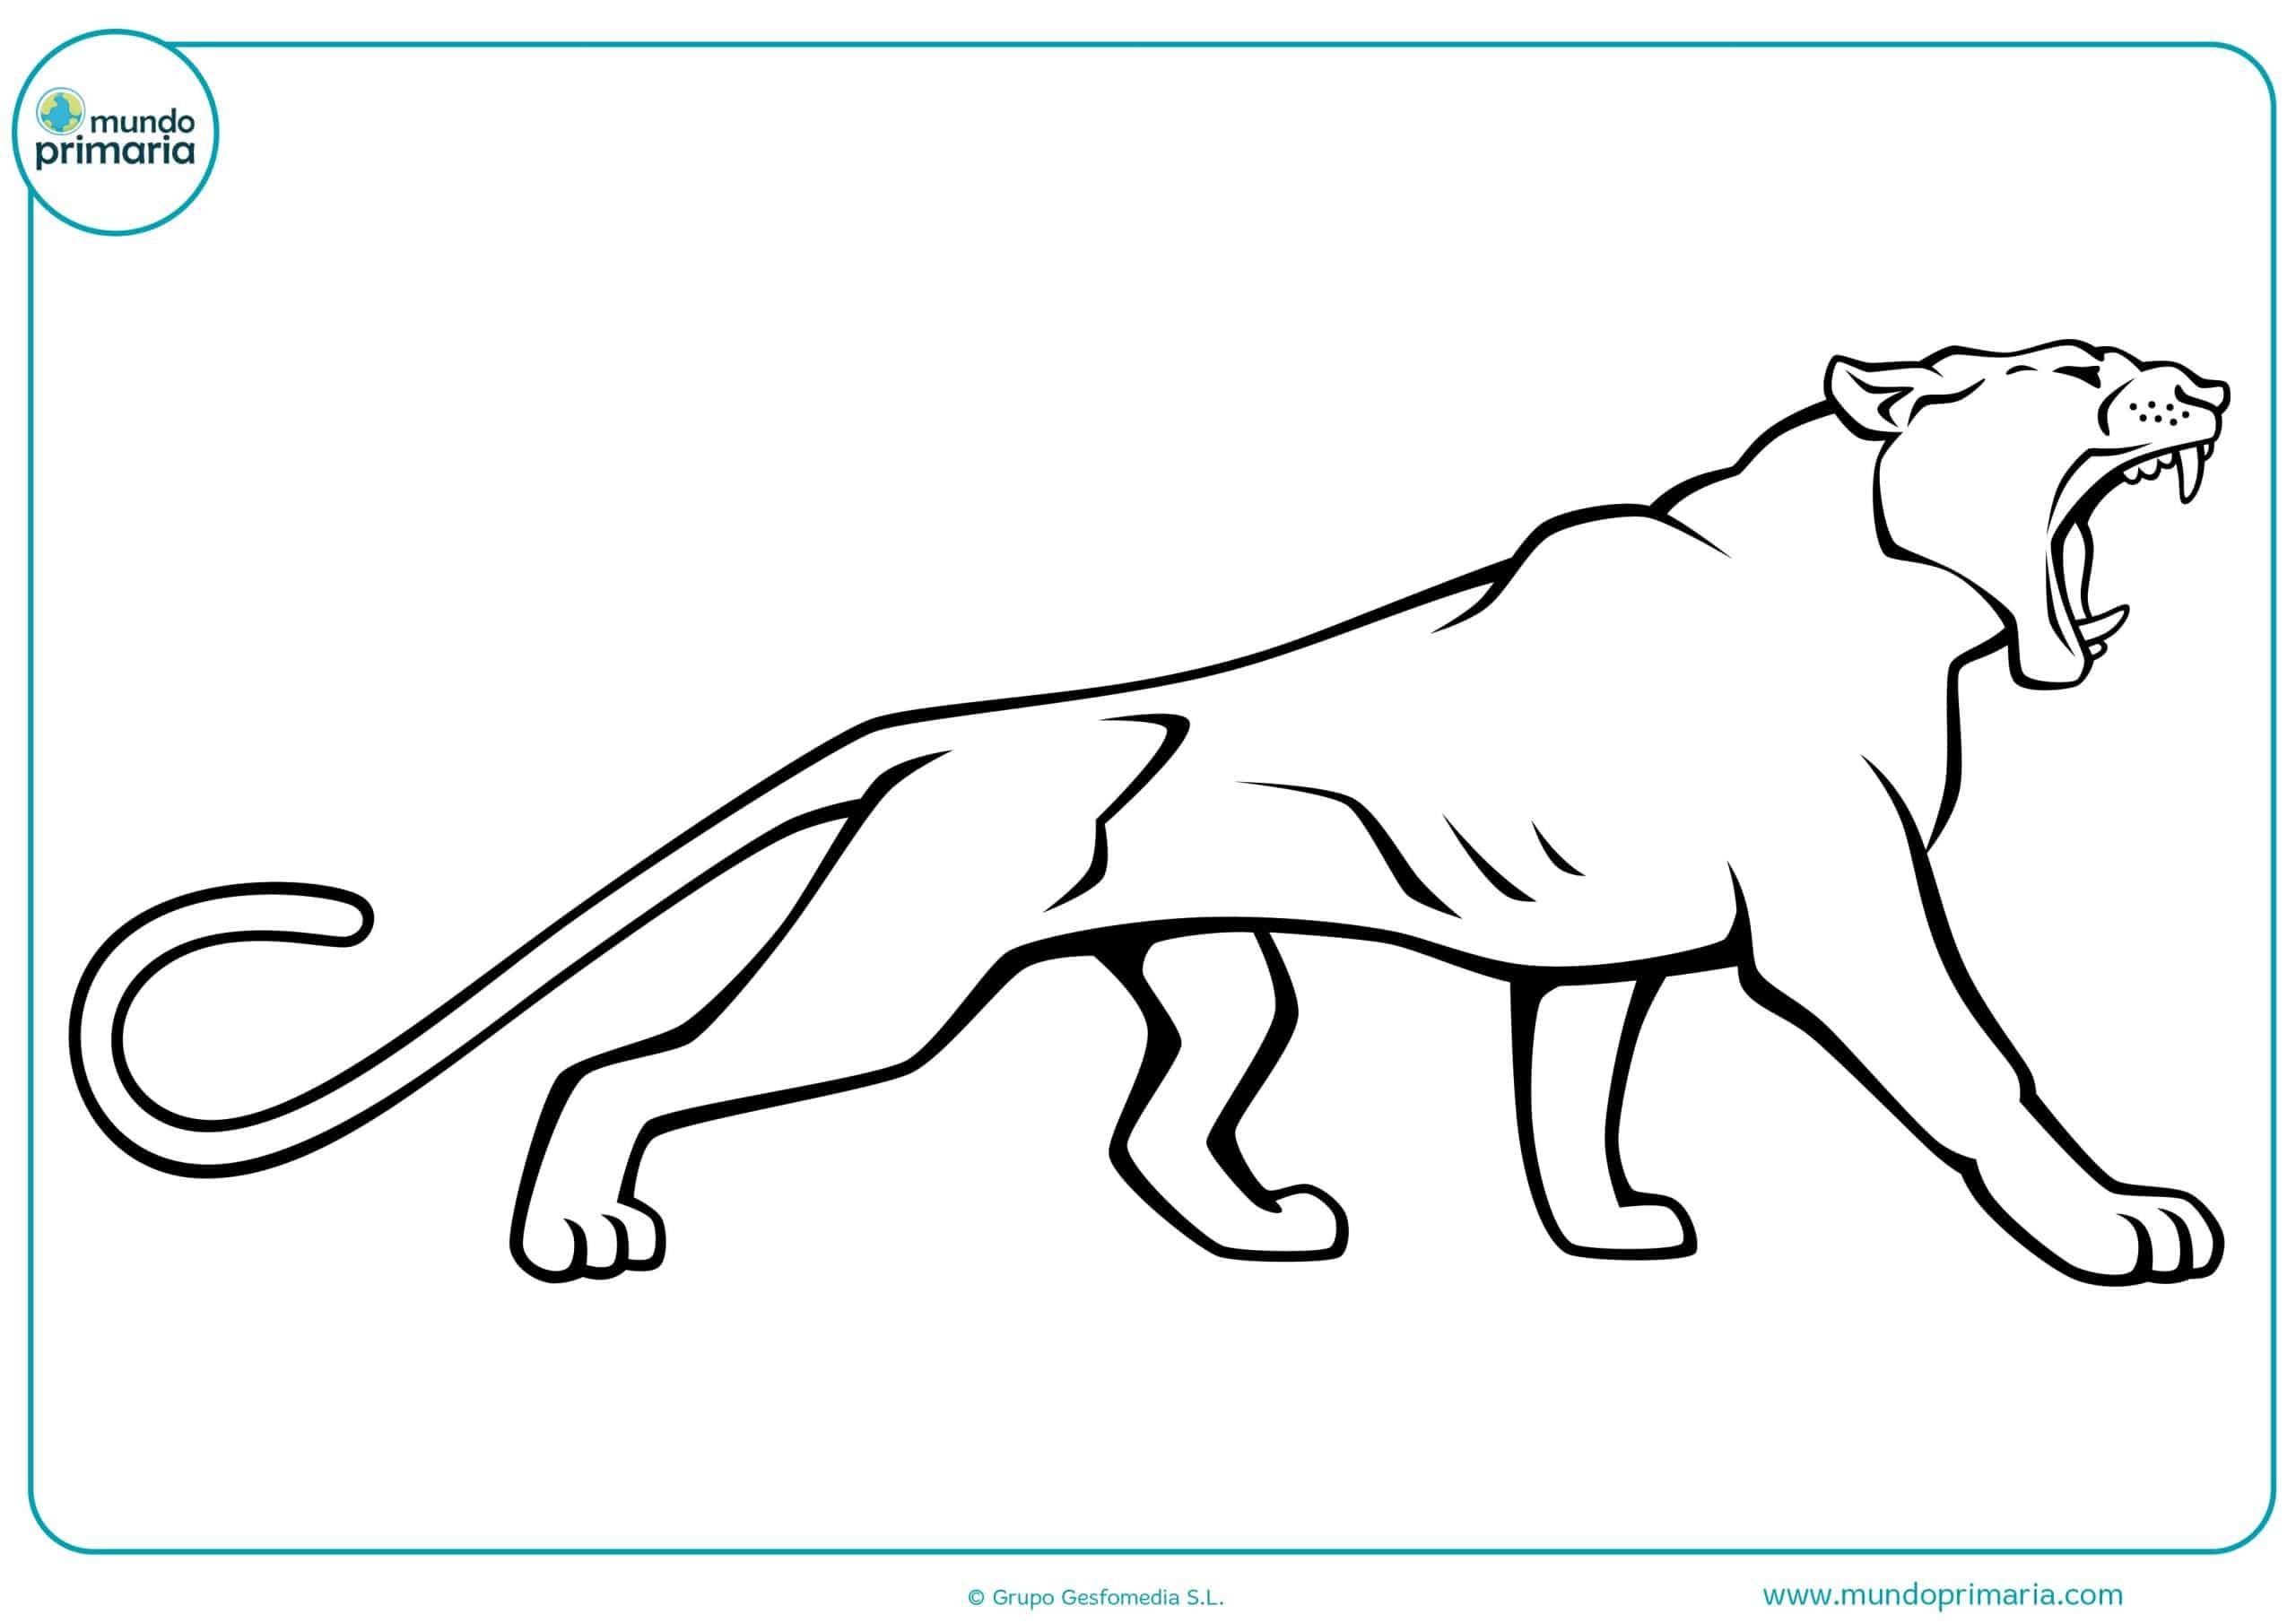 Colorear dibujos animales selva gratis